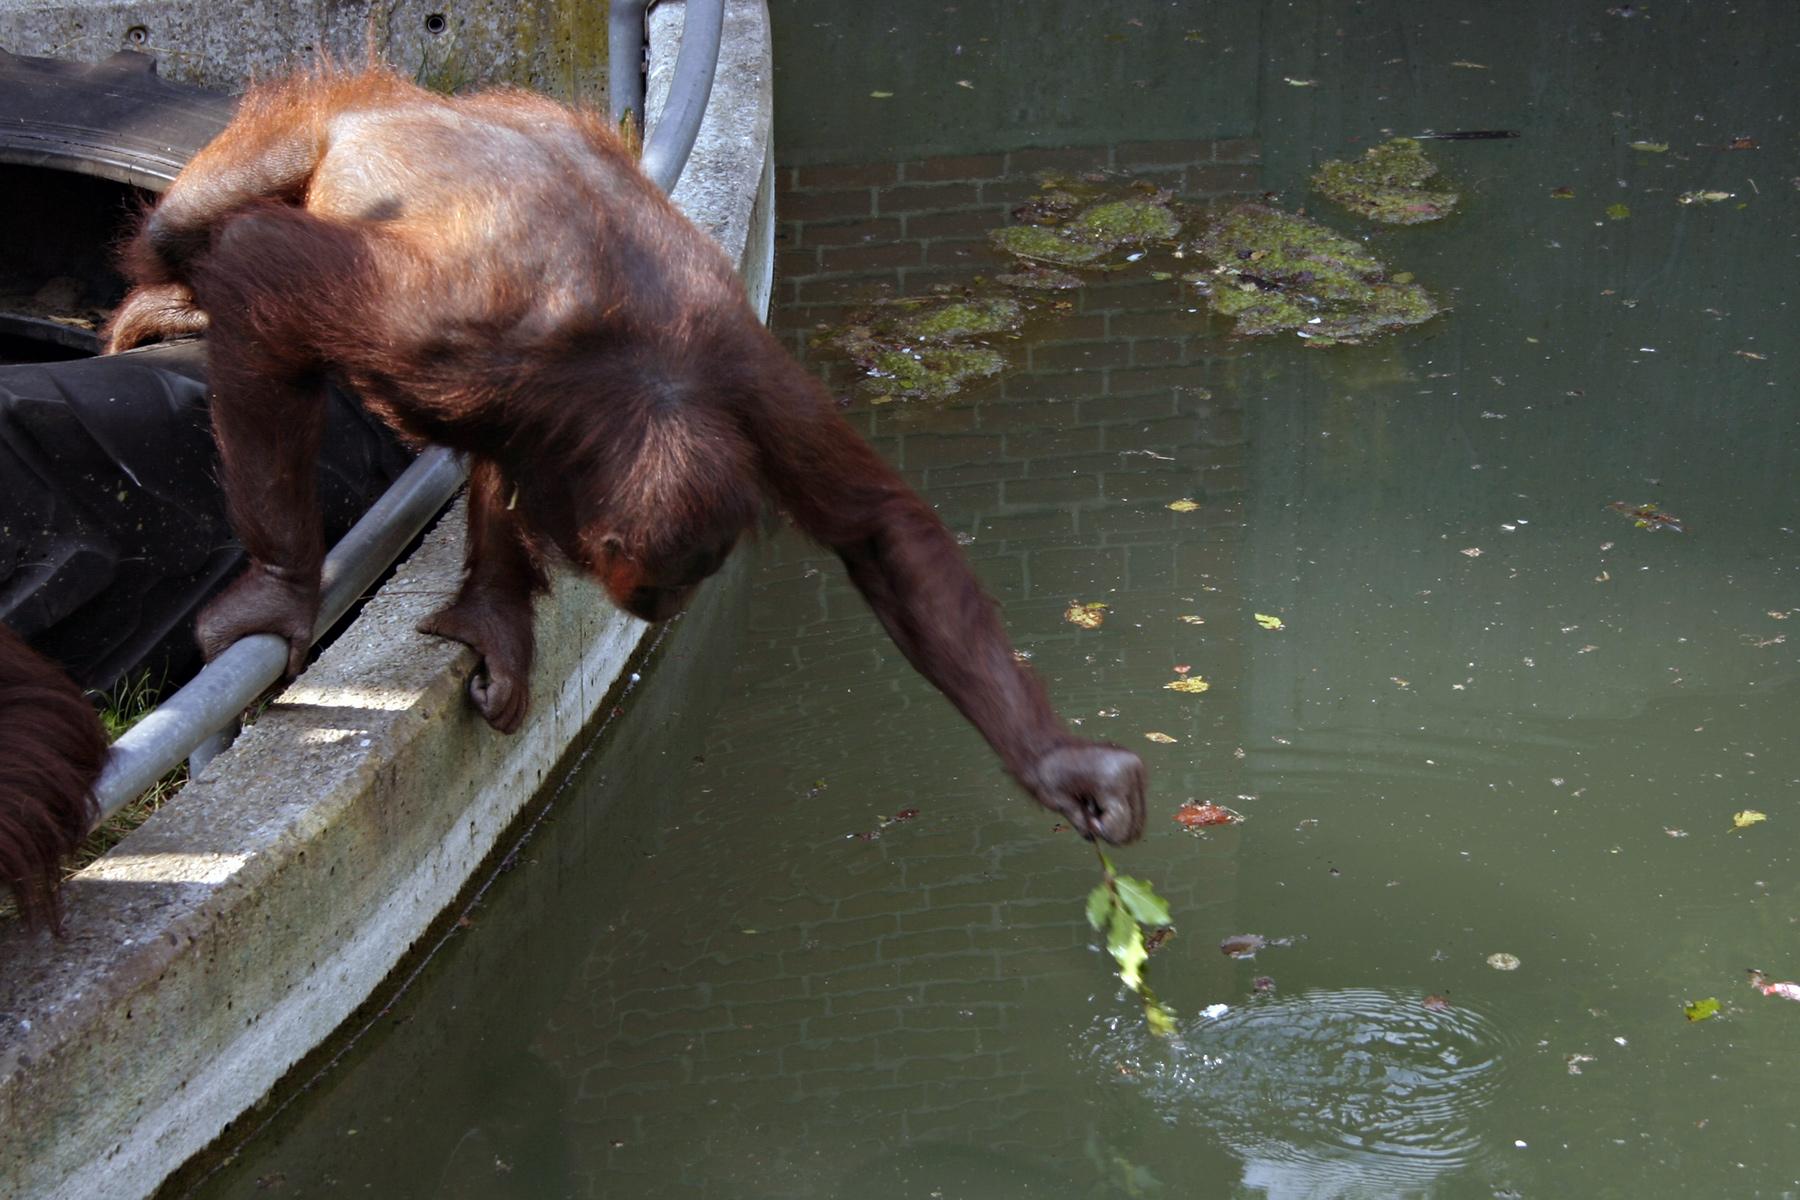 Orangutan stretching for food, Ape, Monkey, Orangutan, Stretching, HQ Photo